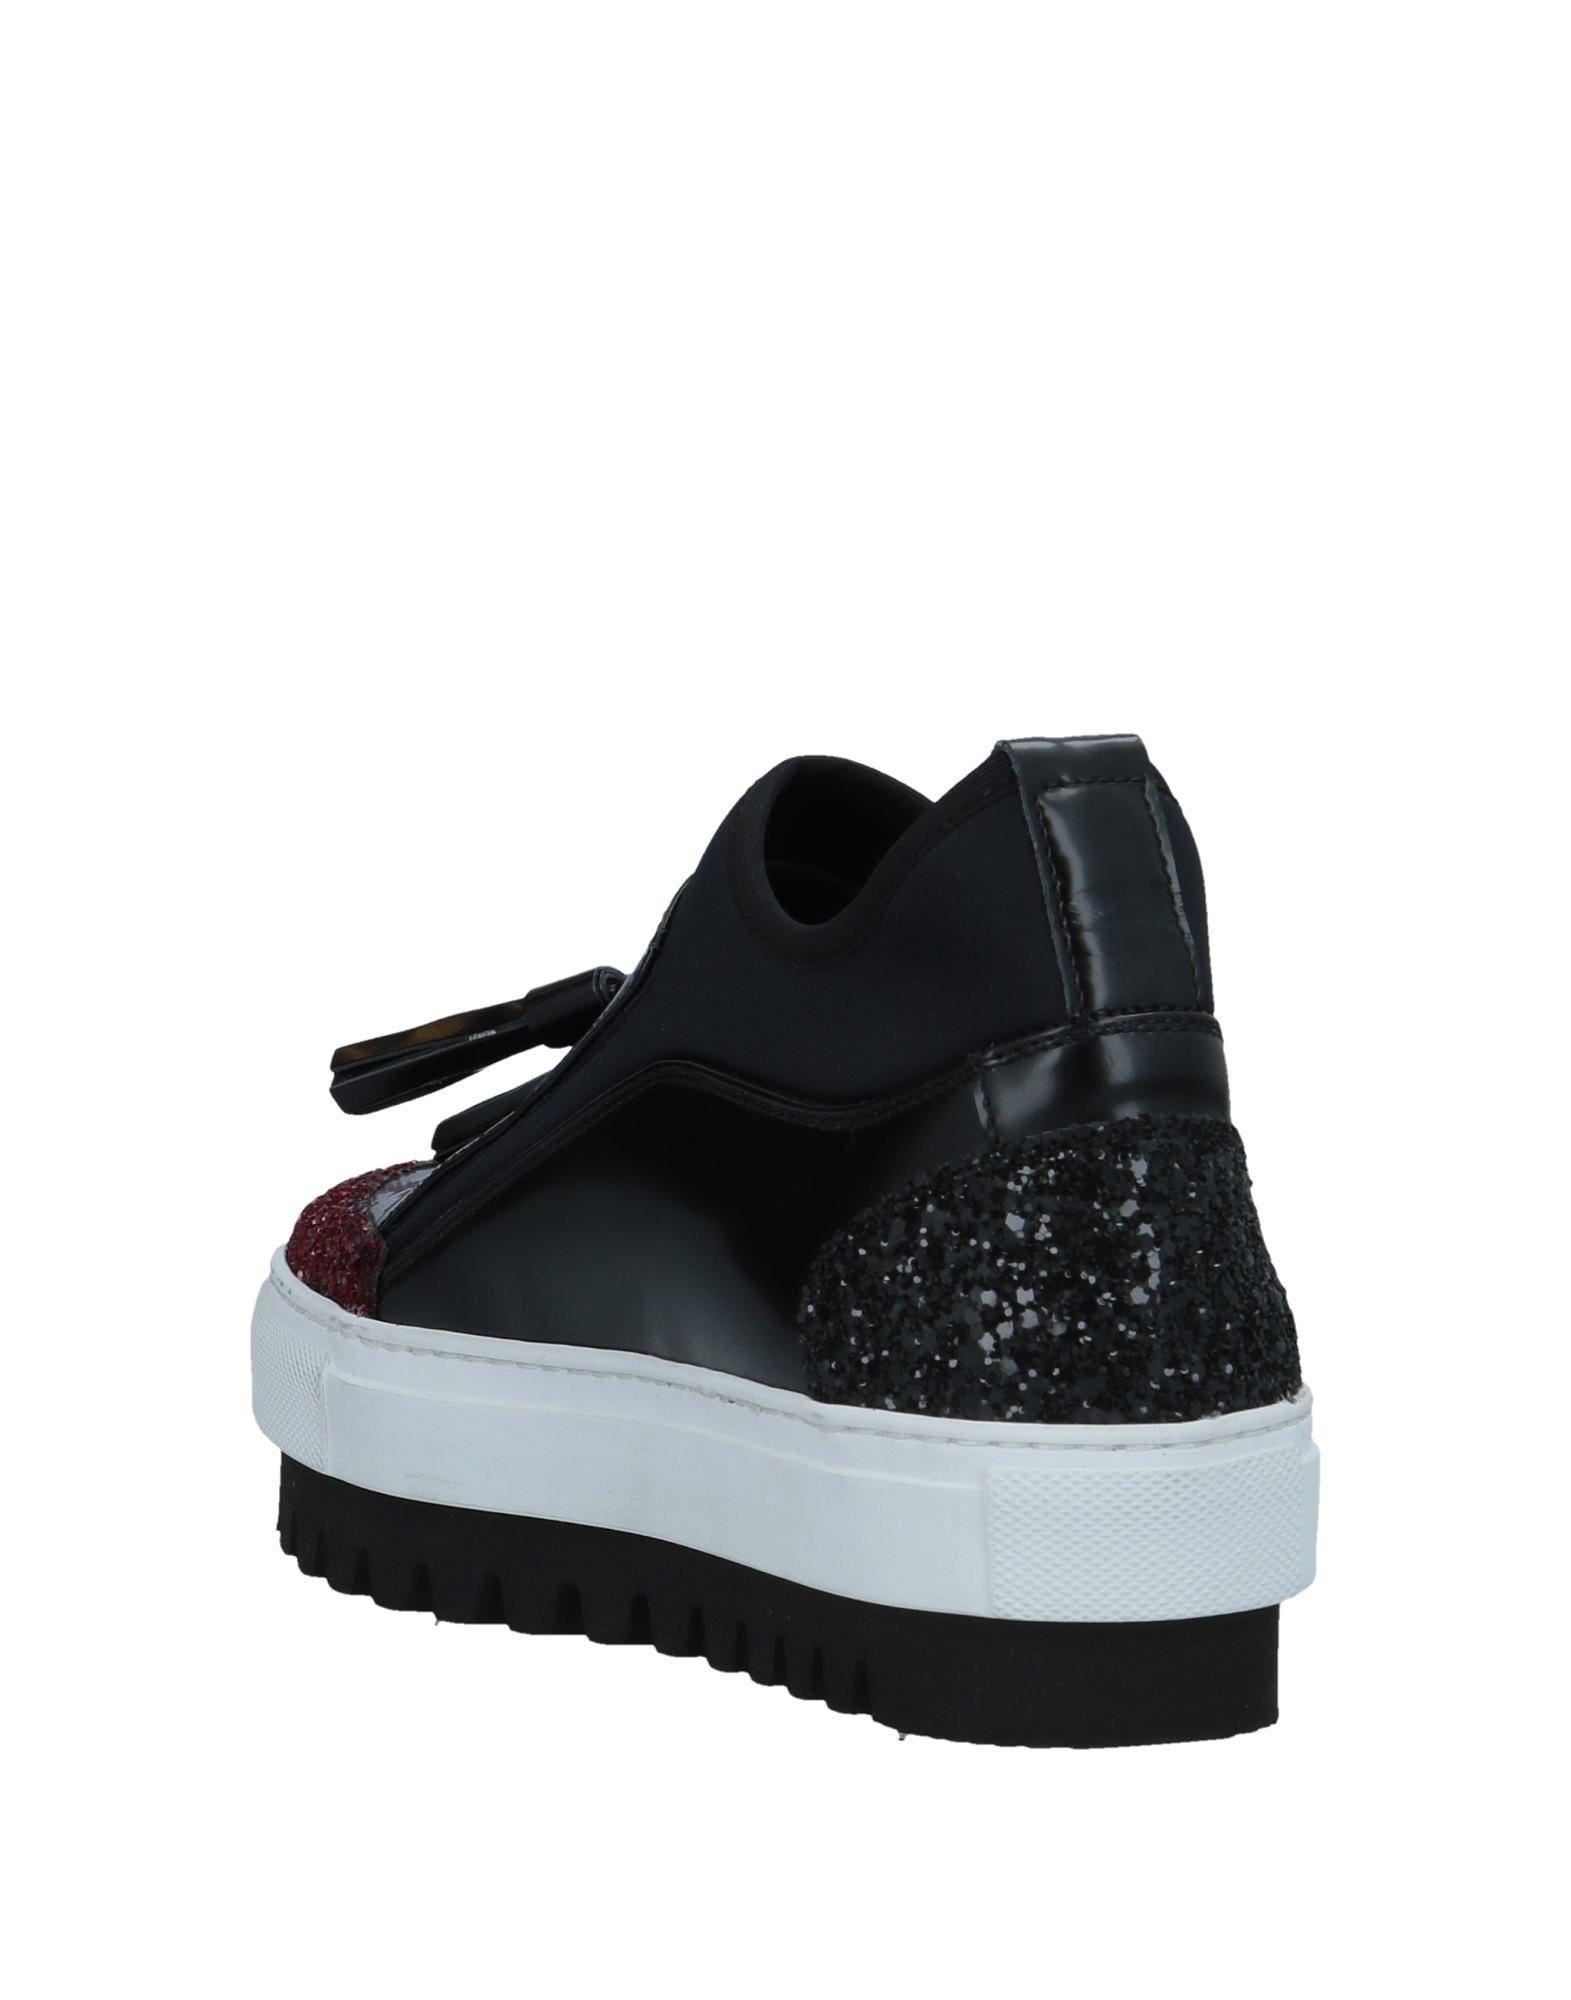 Gut um billige Schuhe zu  tragenLocker 41 Sneakers Damen  zu 11527612XS 217337